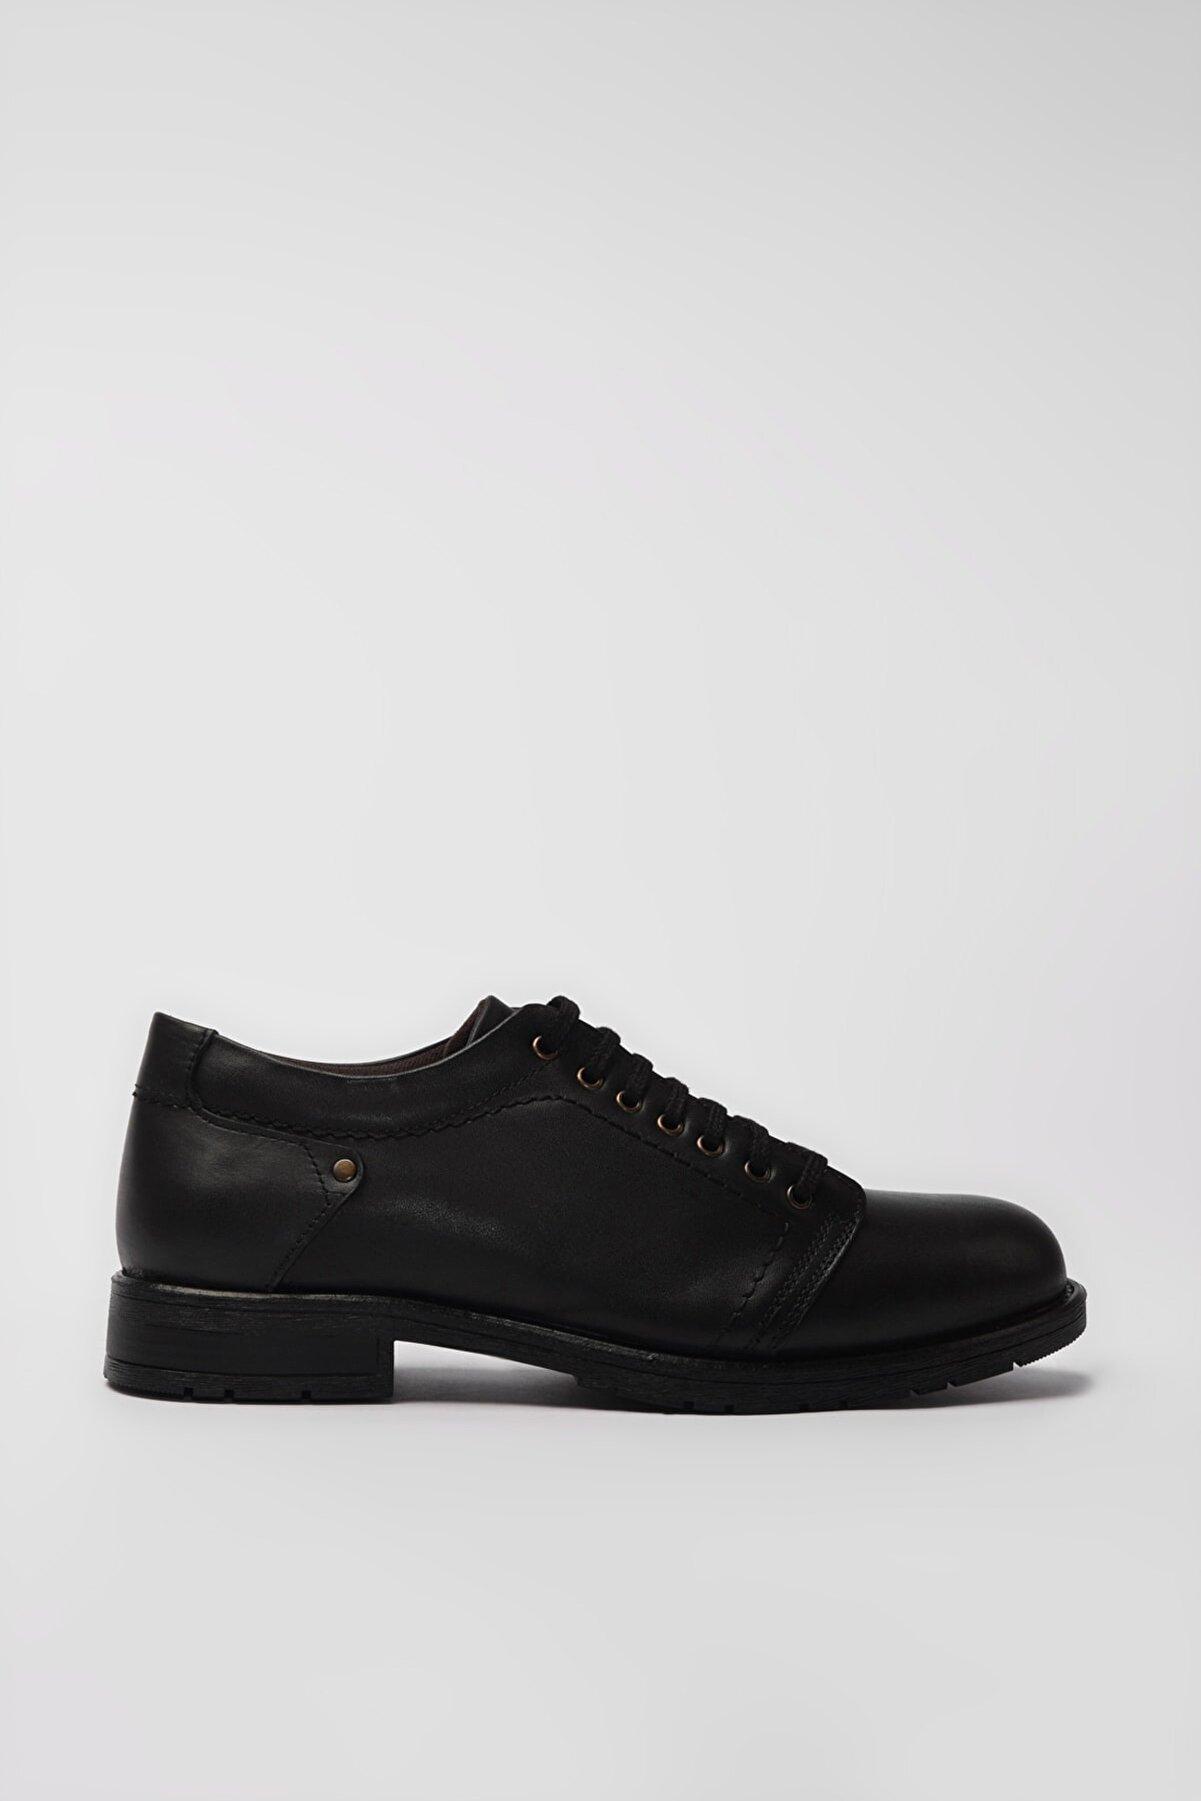 Yaya by Hotiç Hakiki Deri Siyah Erkek Casual Ayakkabı 02AYY194960A100